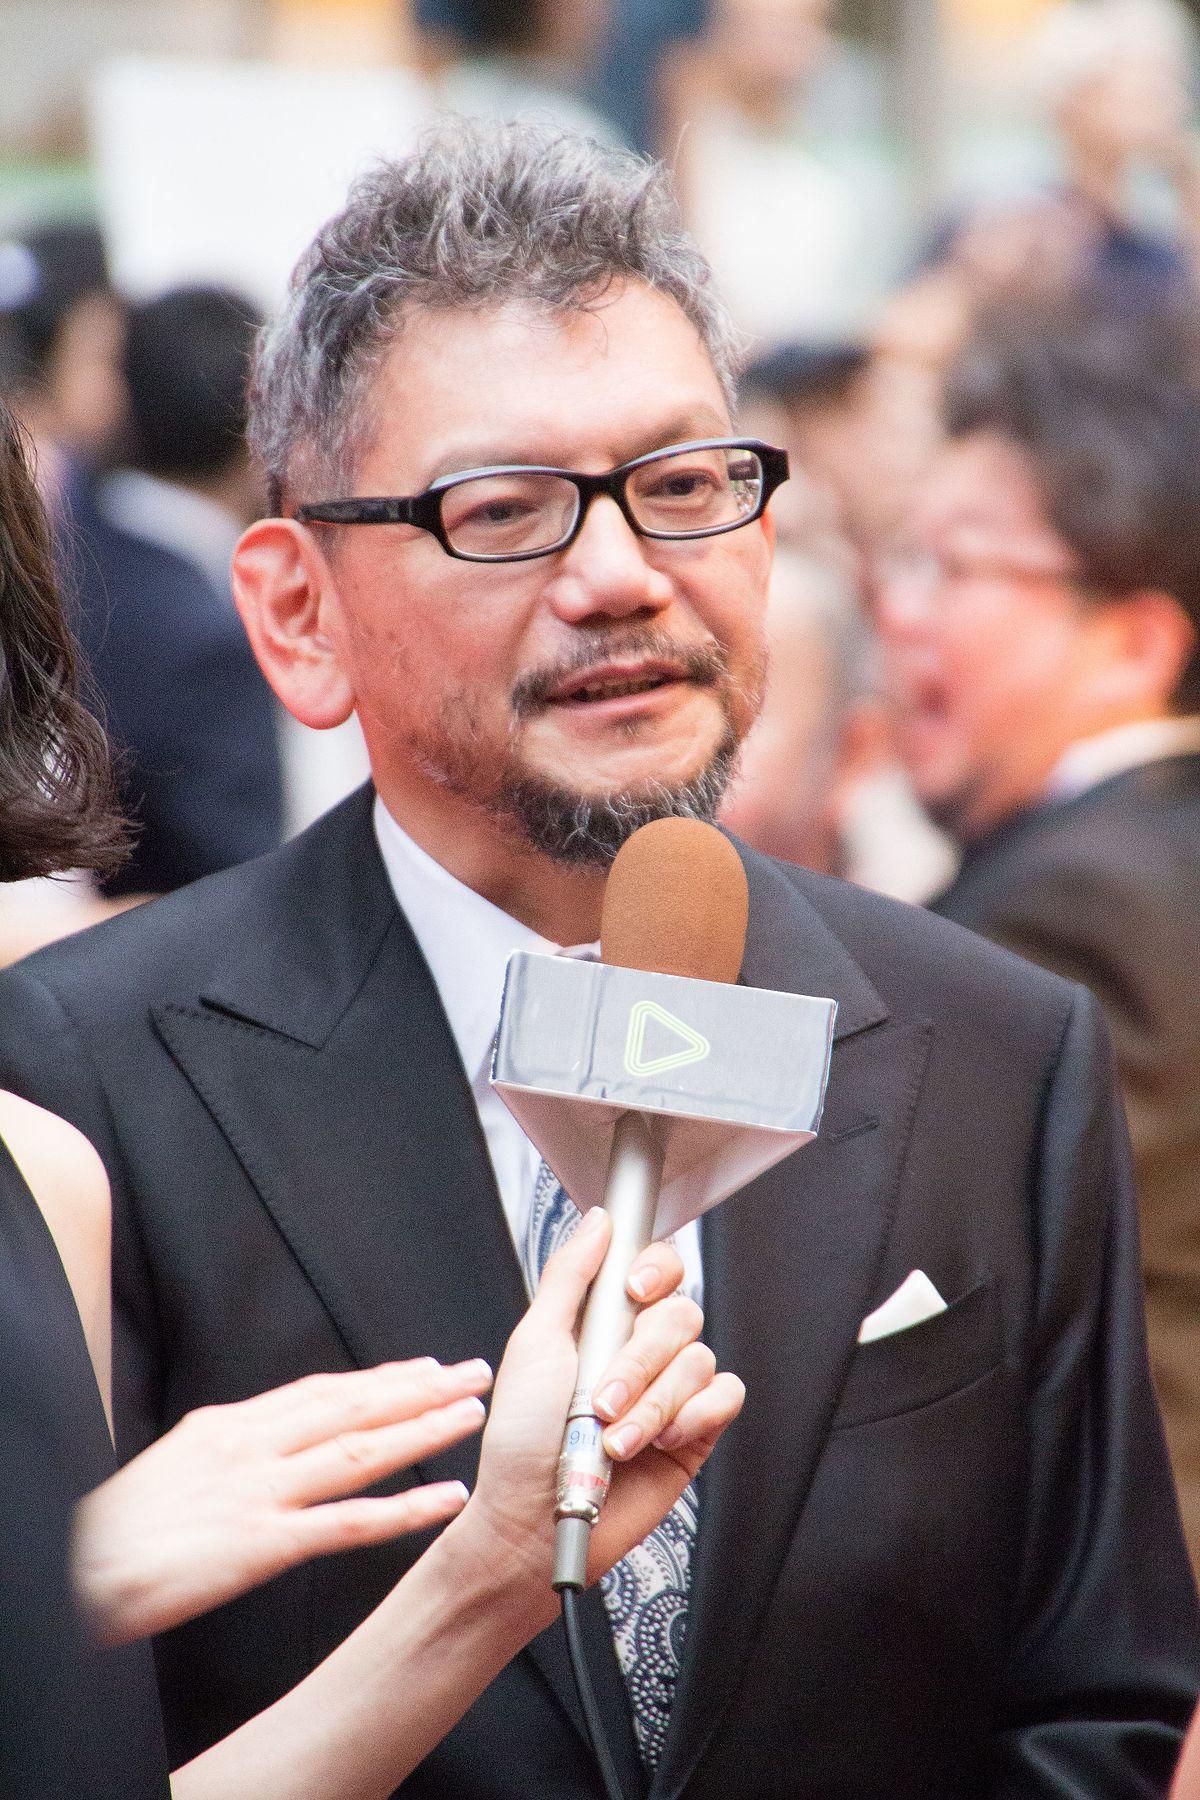 庵野秀明 - Wikipedia